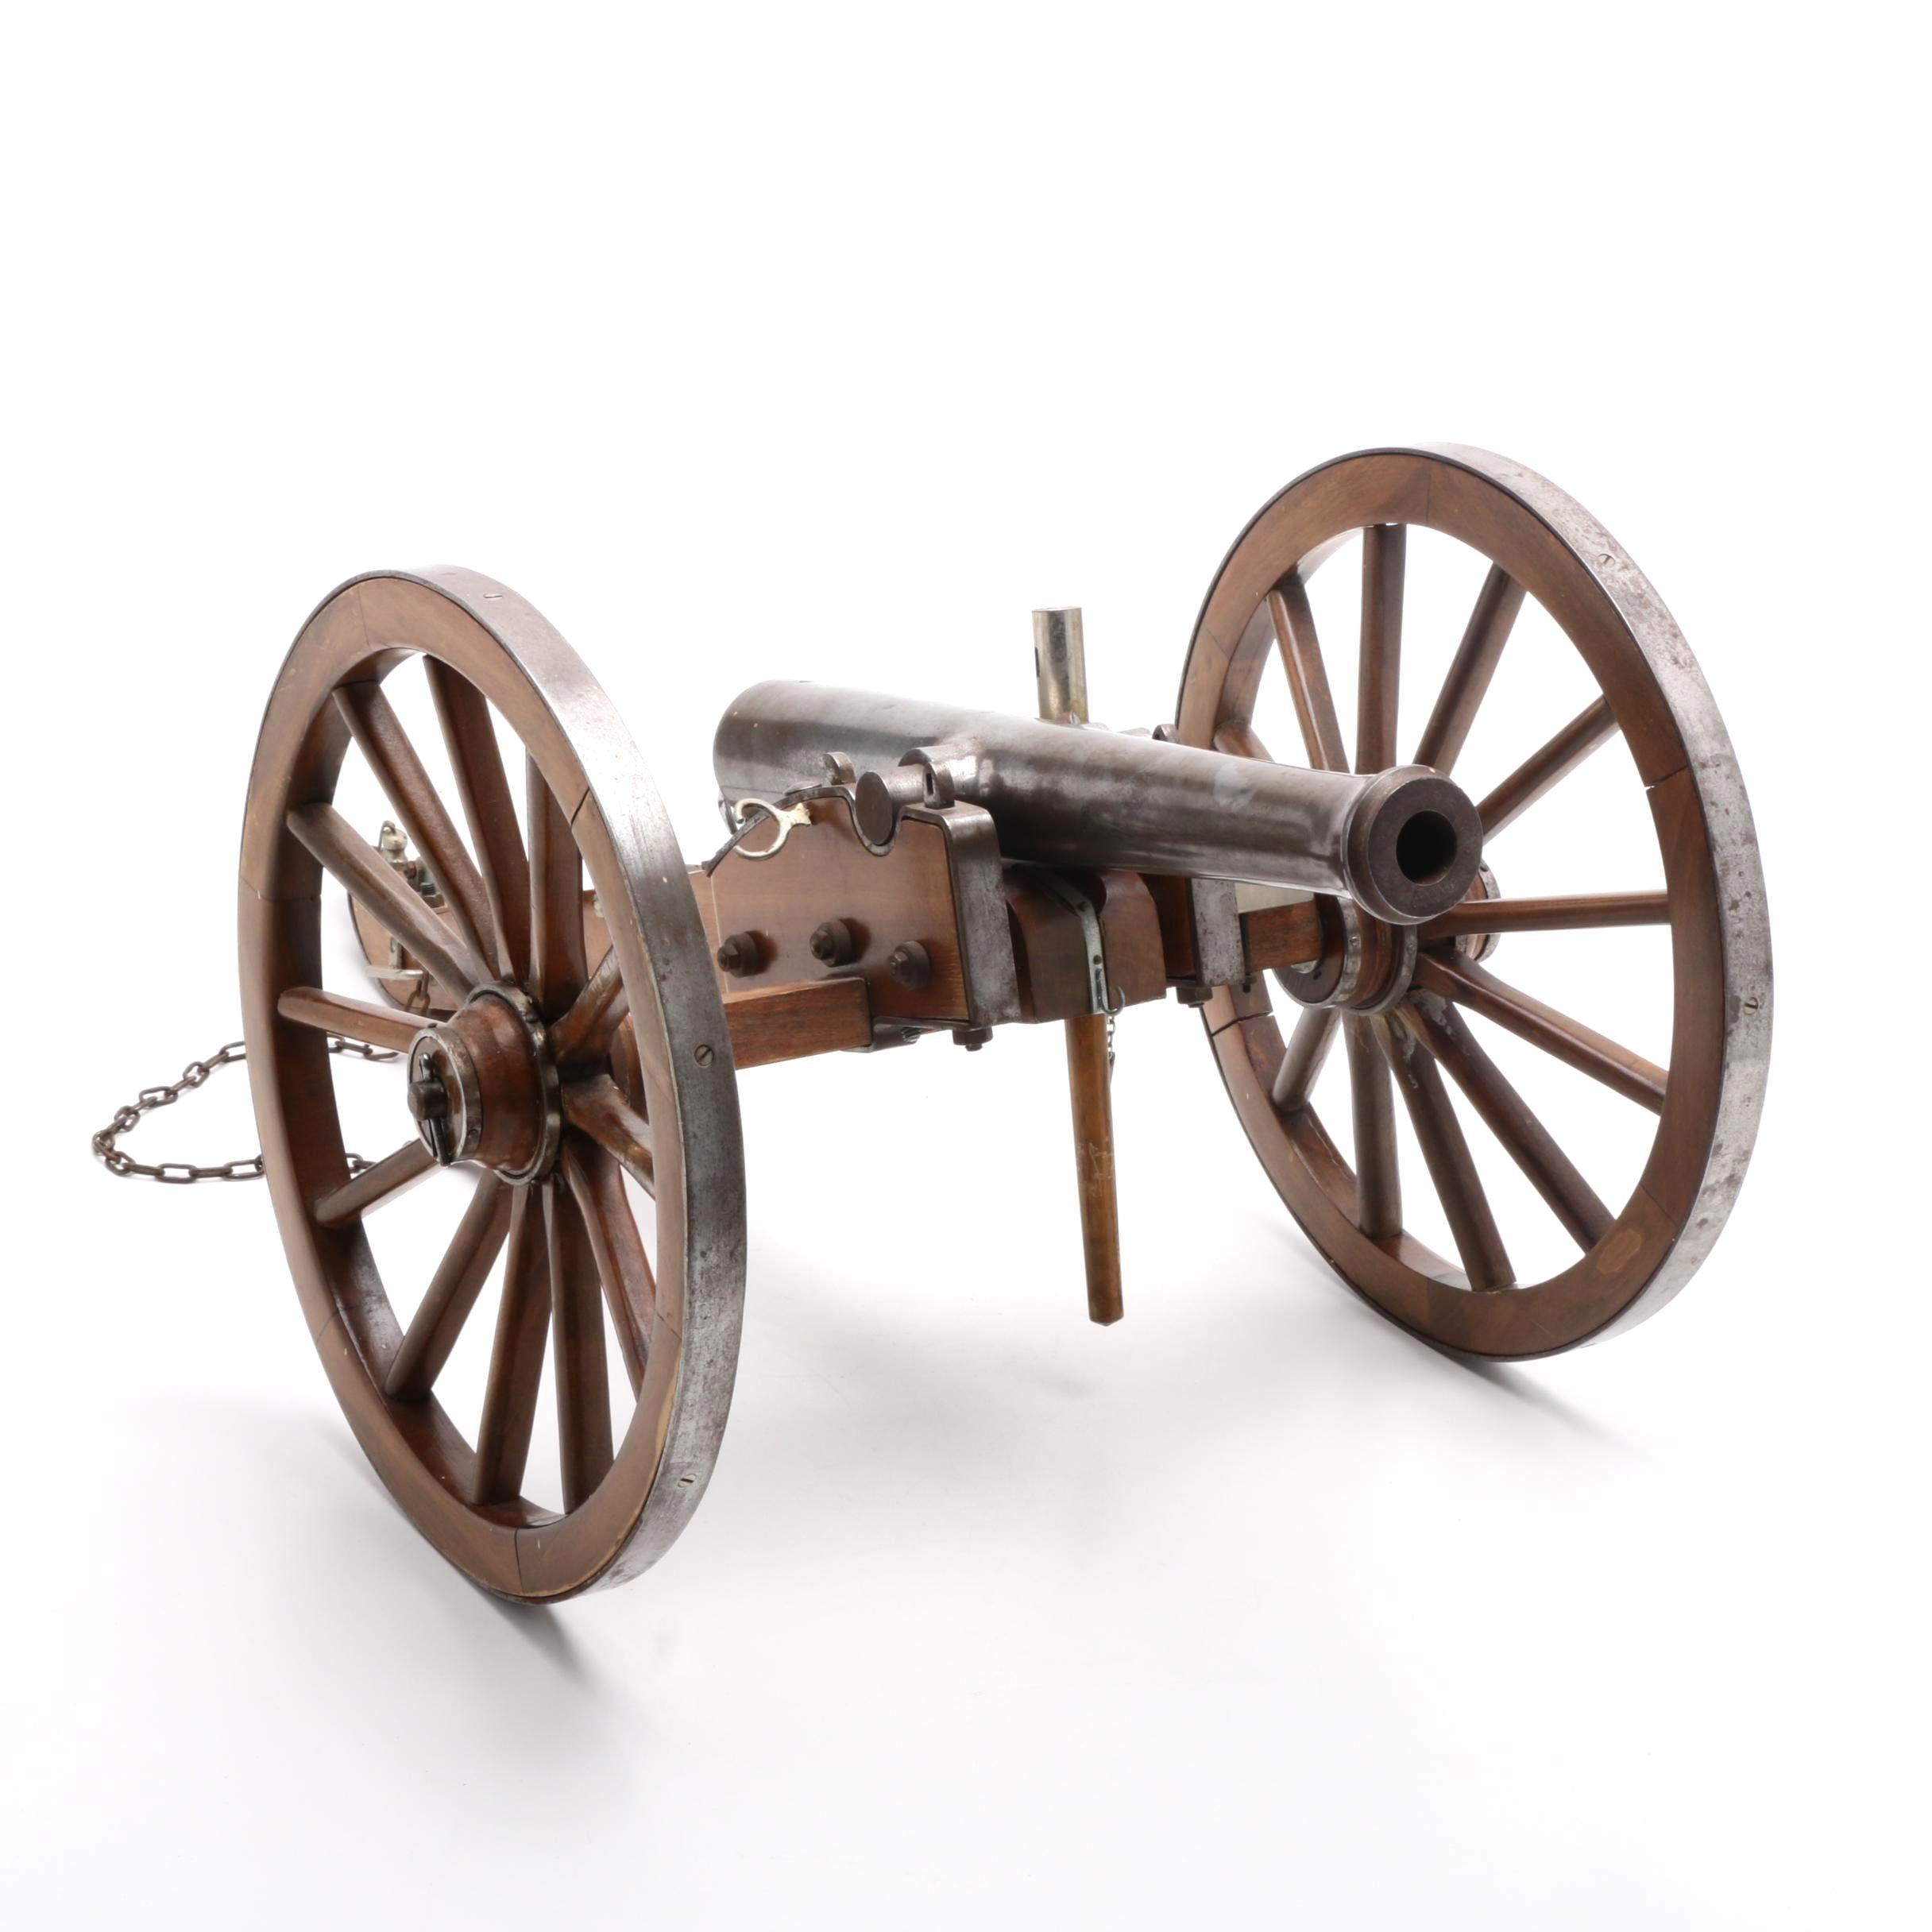 Jukar Spain .70 Cal Black Powder Civil War Model Cannon